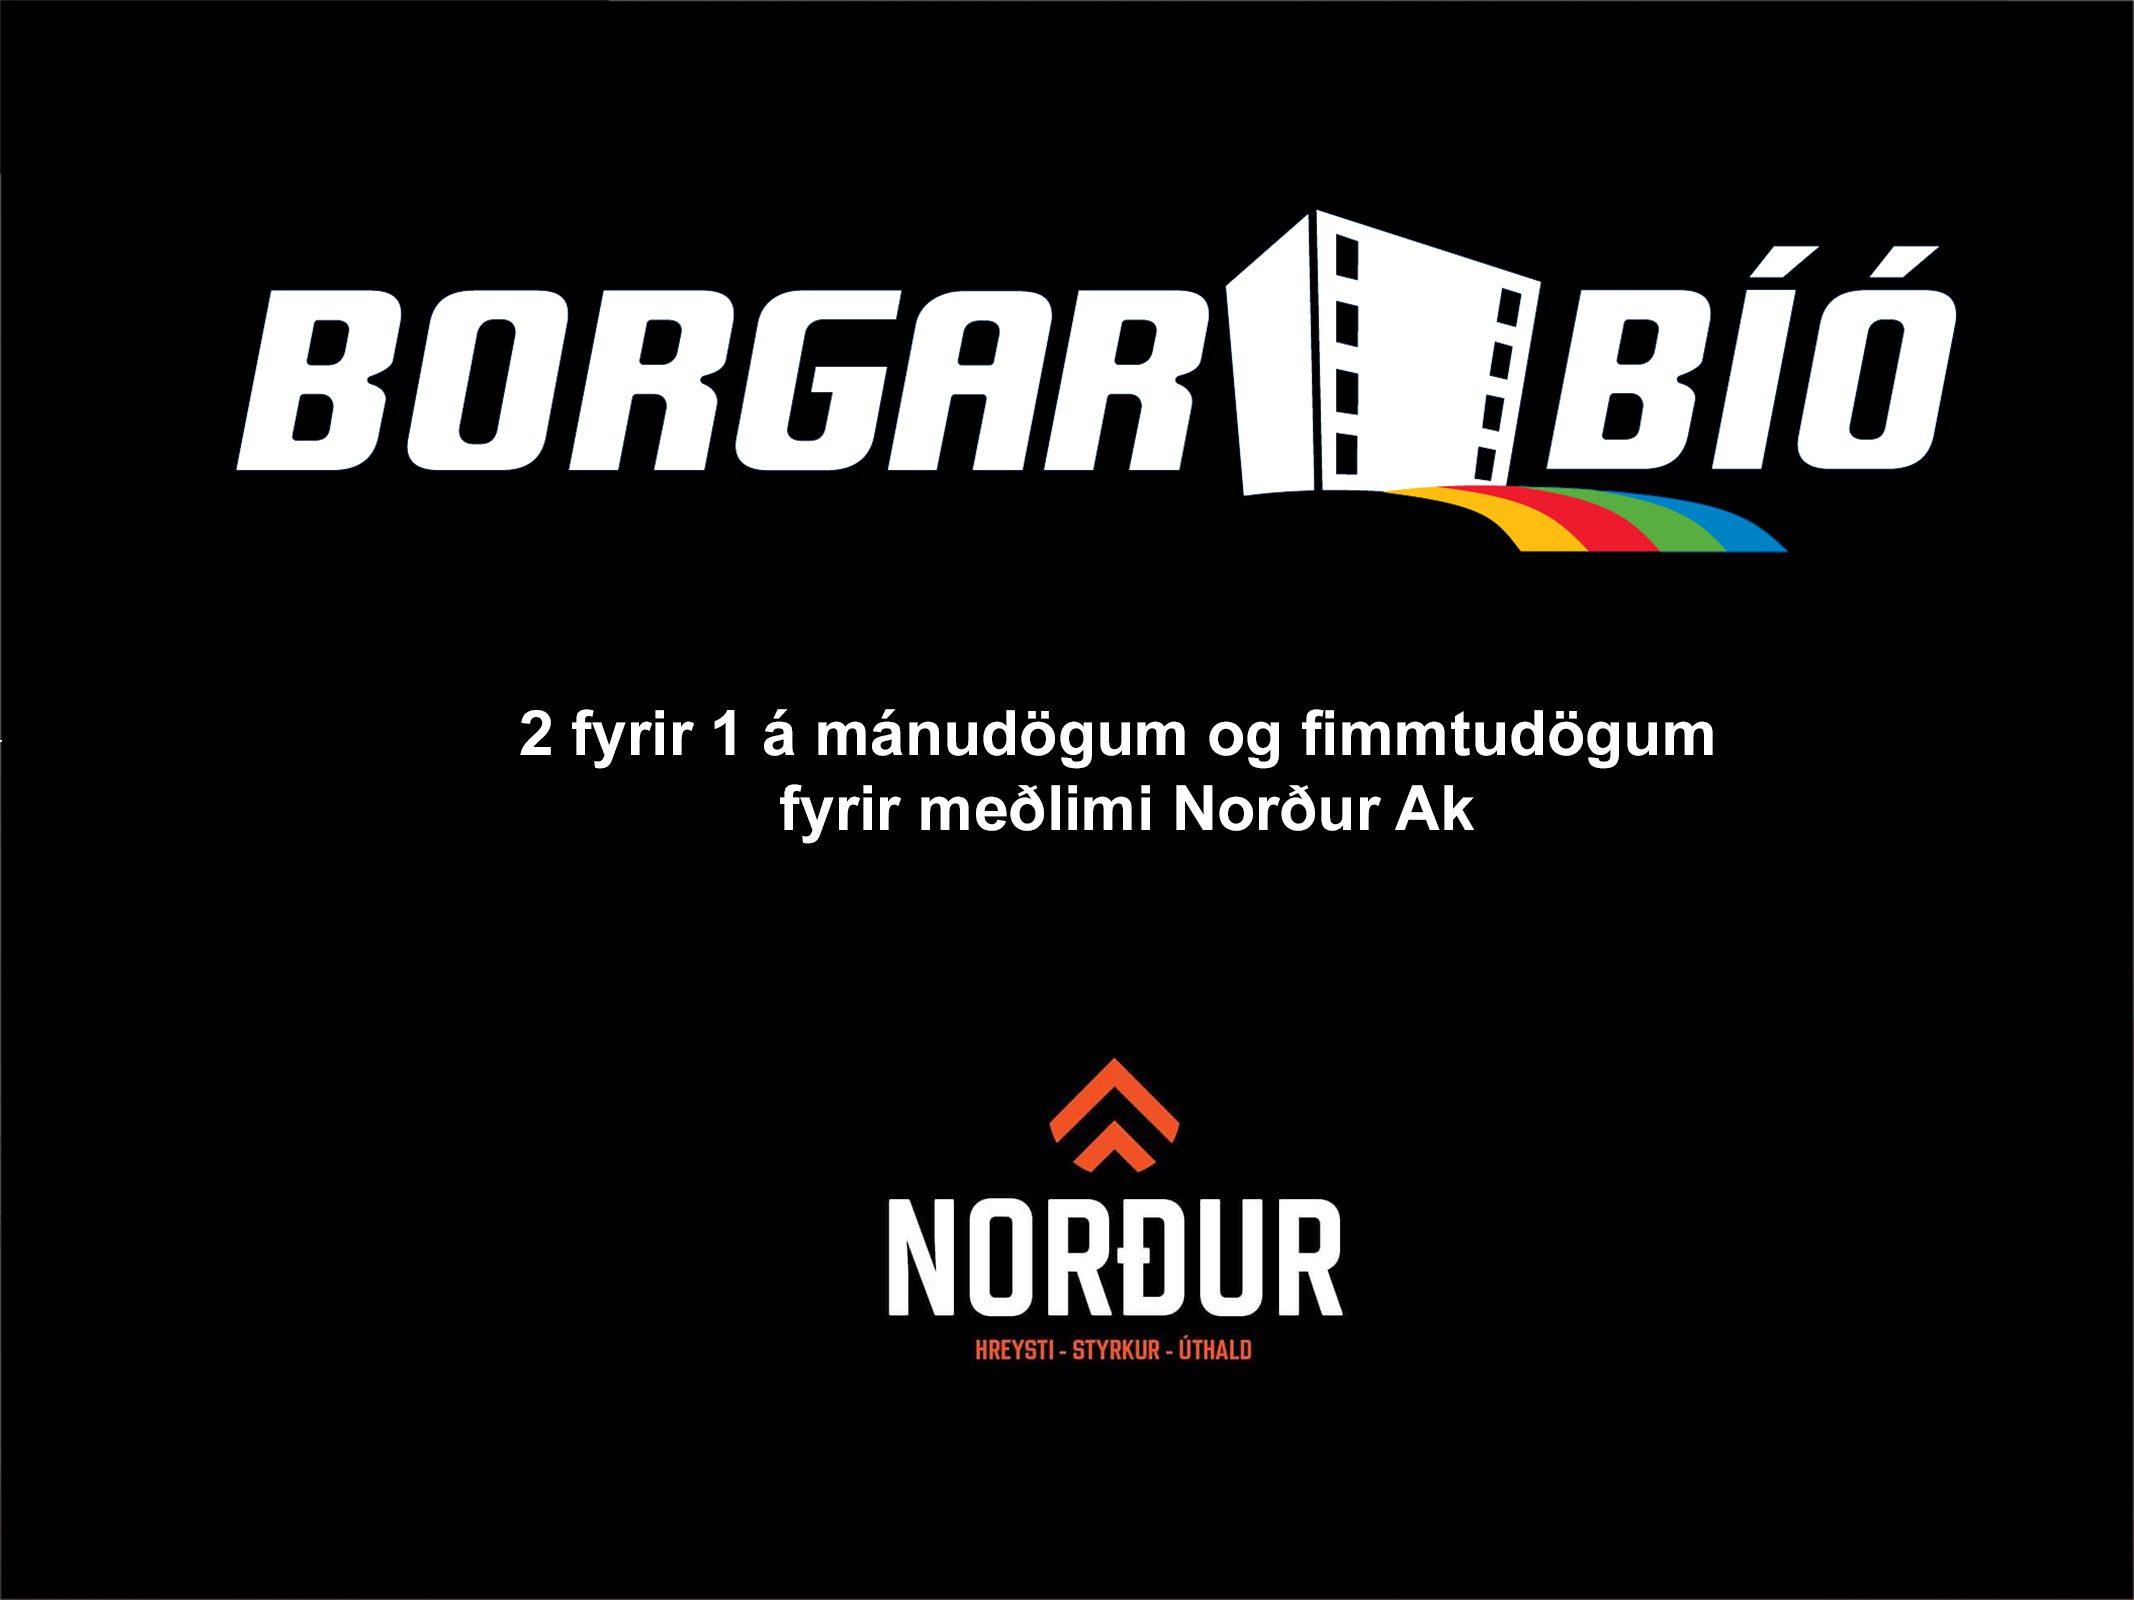 Borgarbíó,nordur